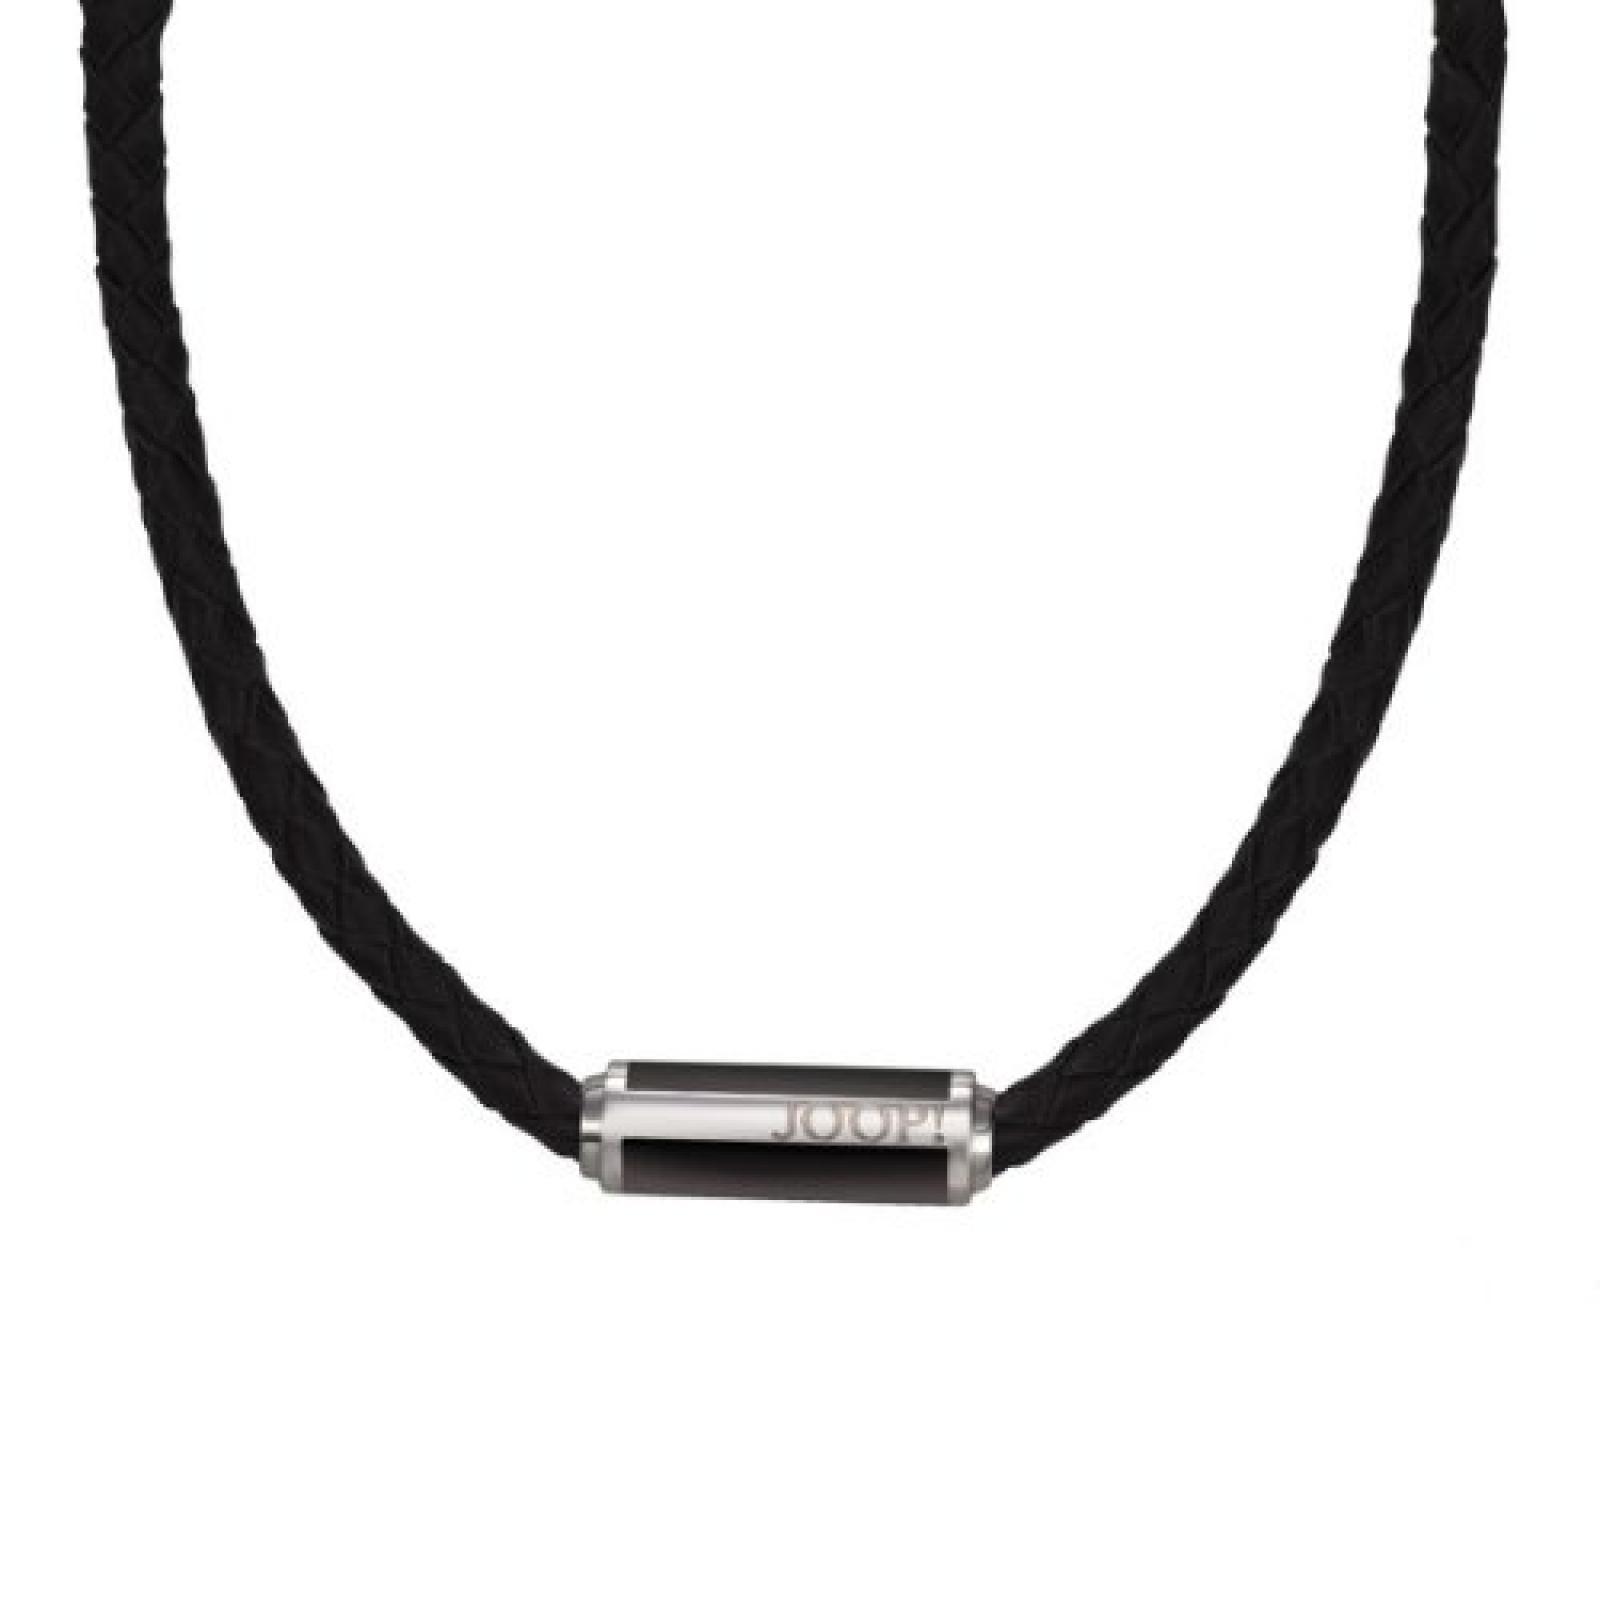 Joop Herren-Halskette Sharp Epoxy schwarz Leder Edelstahl ca. 50 cm JPNL10555A500